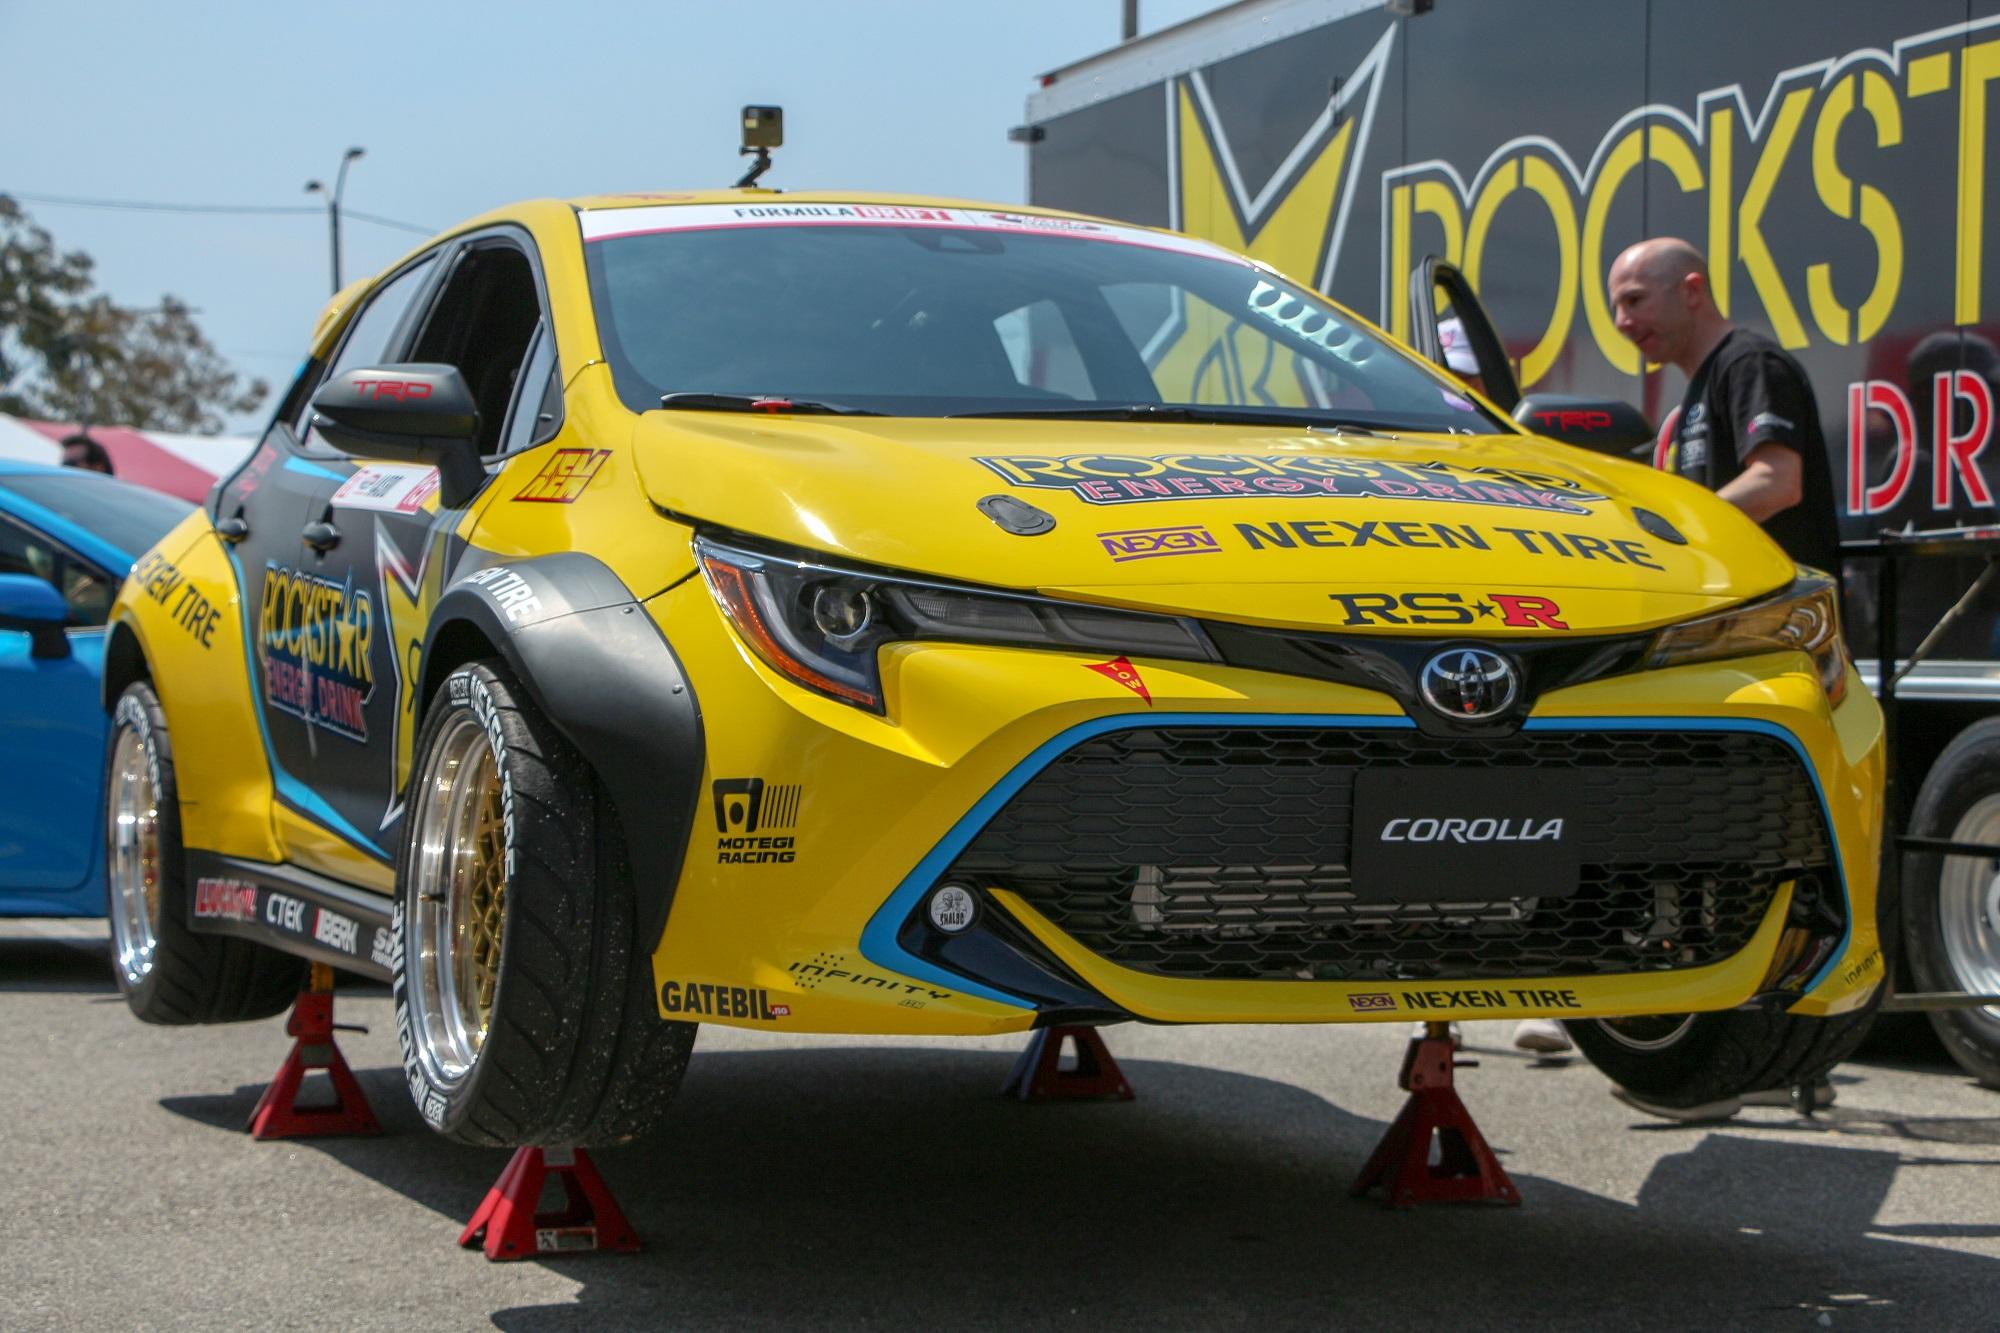 Scionlife.com Formula Drift Long Beach 2018 Toyota Racing 2018 2019 Toyota Corolla FD Fredric Aasbo